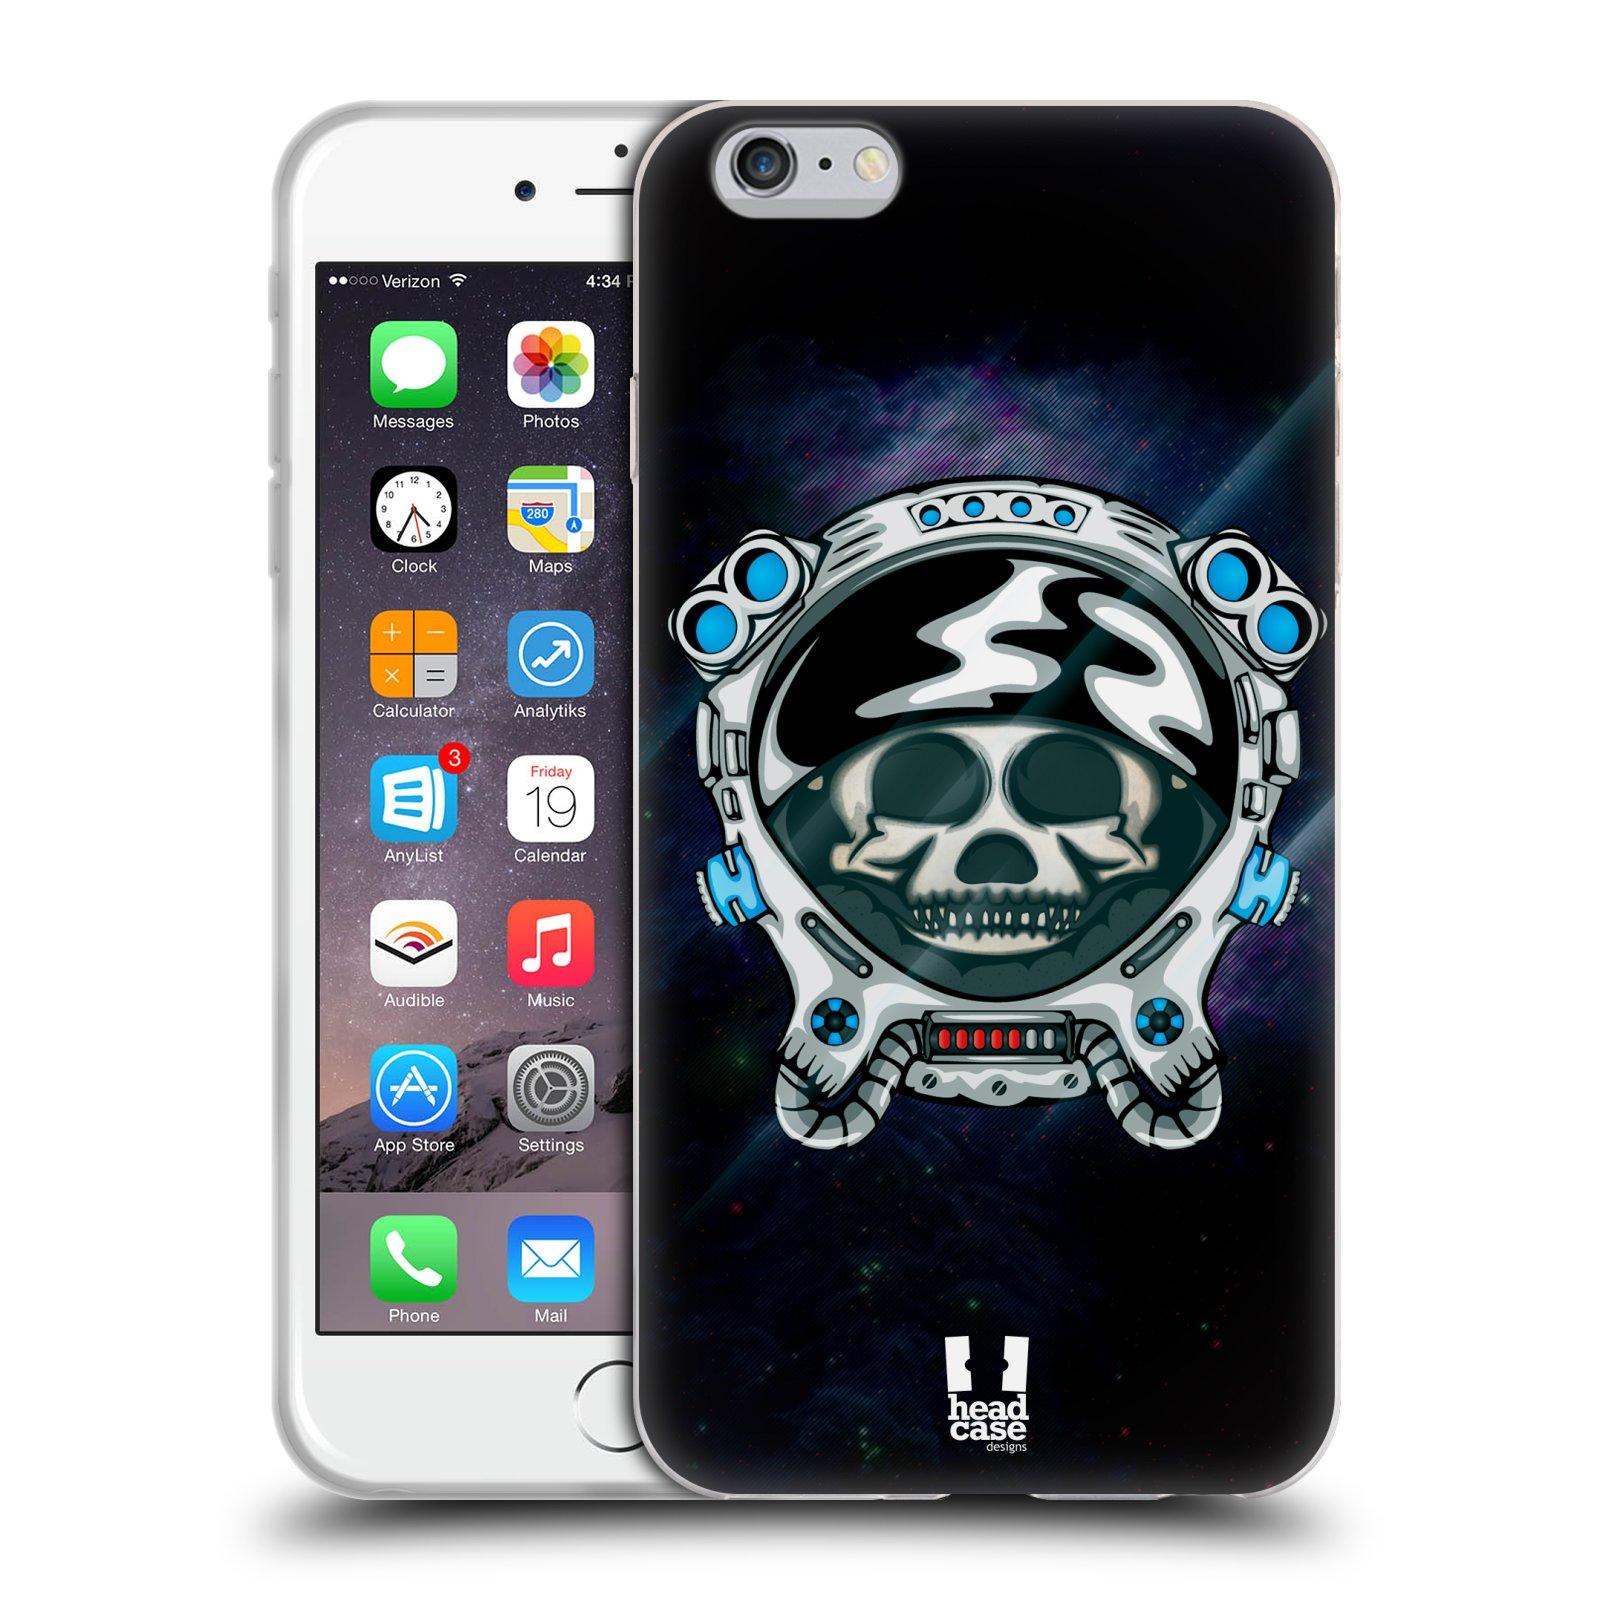 HEAD CASE silikonový obal na mobil Apple Iphone 6 PLUS/ 6S PLUS vzor zvířecí lebka astronaut medvěd